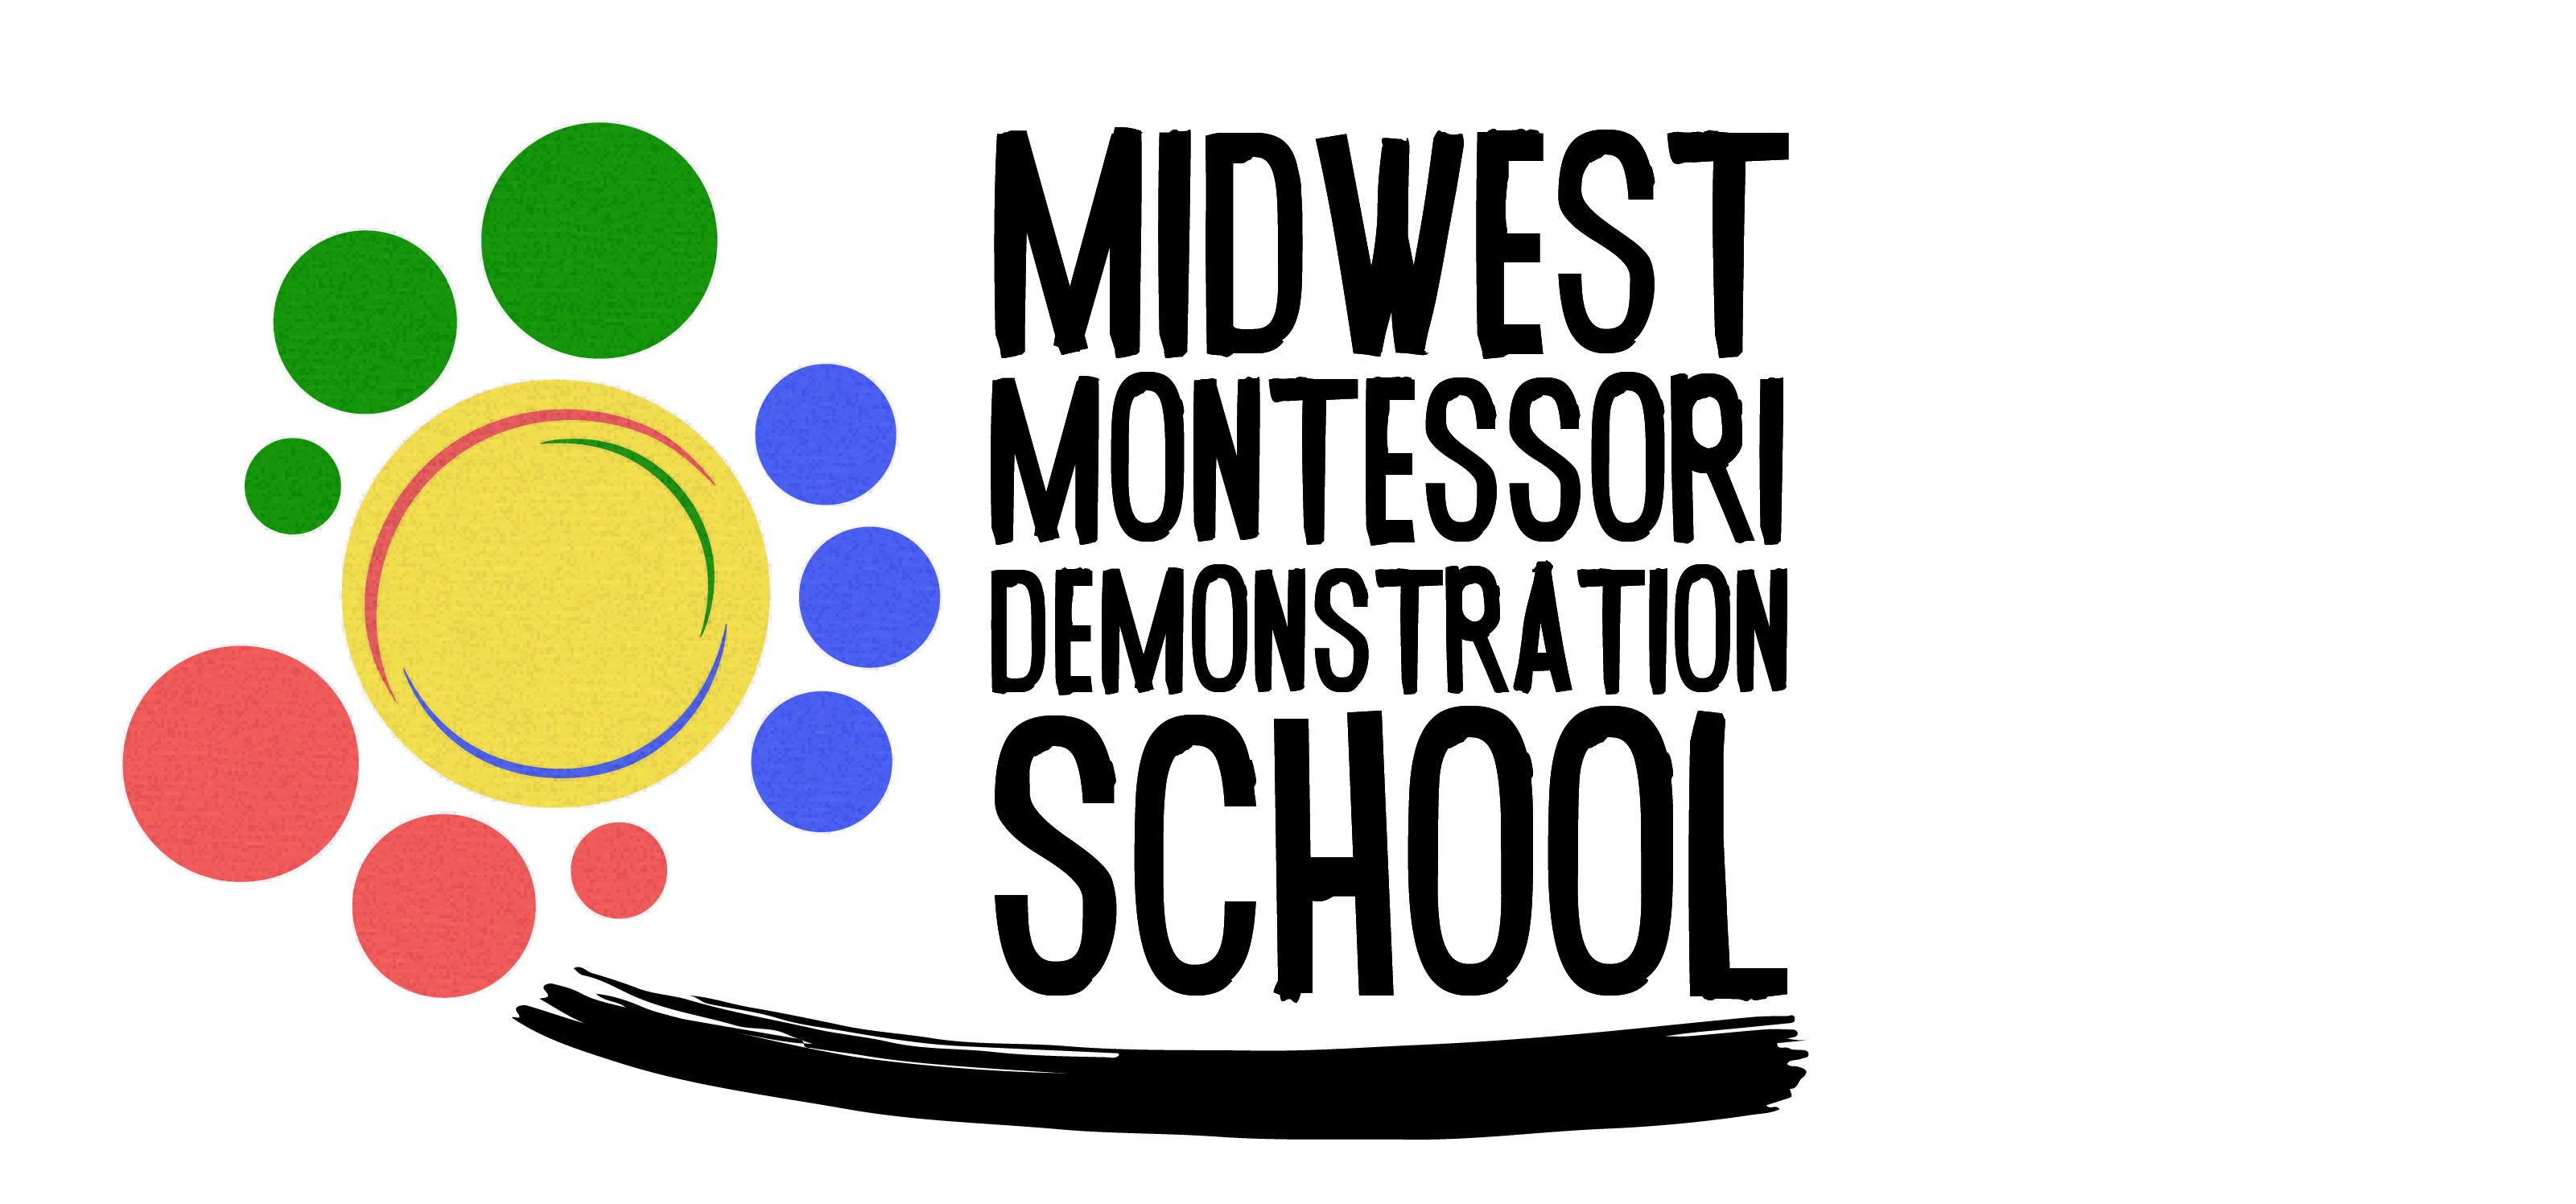 Midwest Montessori Demonstration School